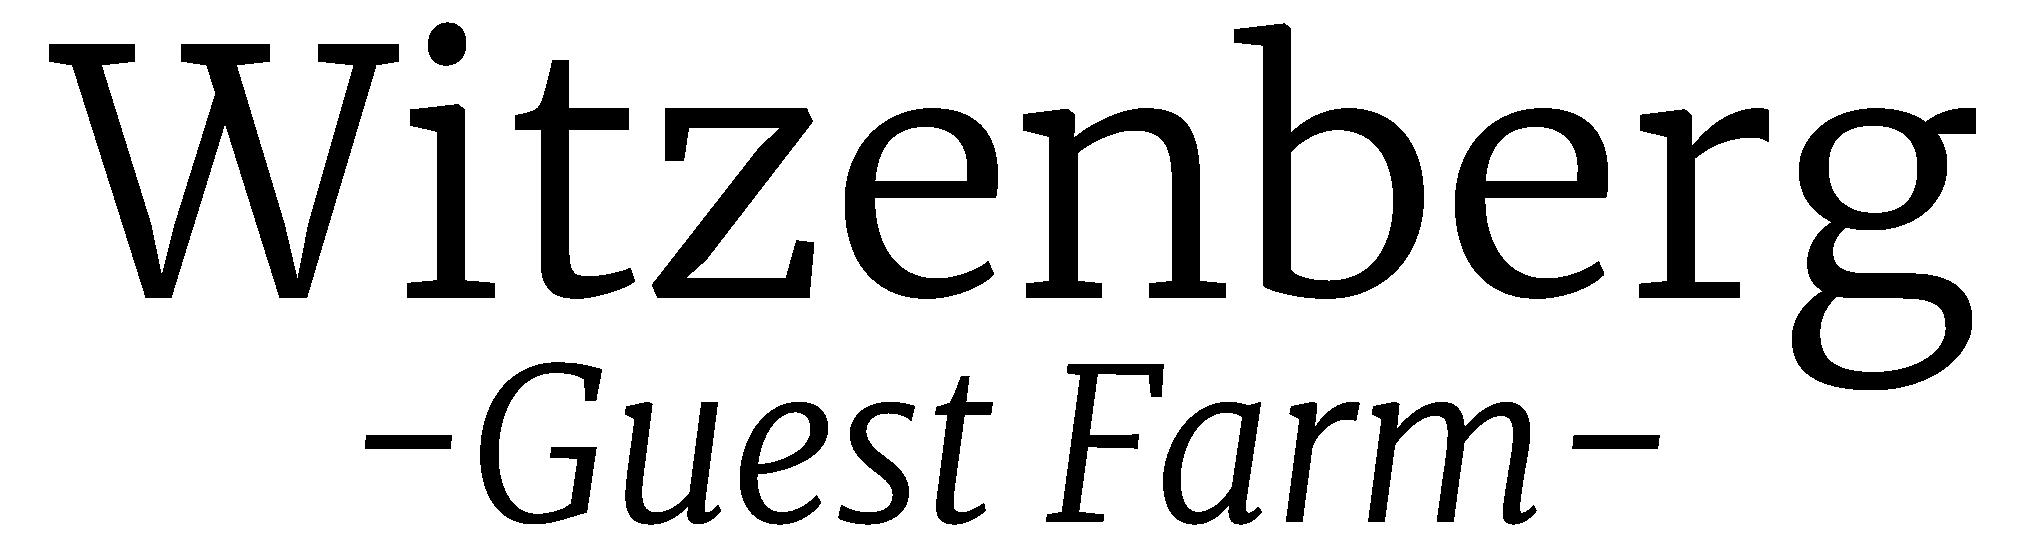 witzenberg-logo